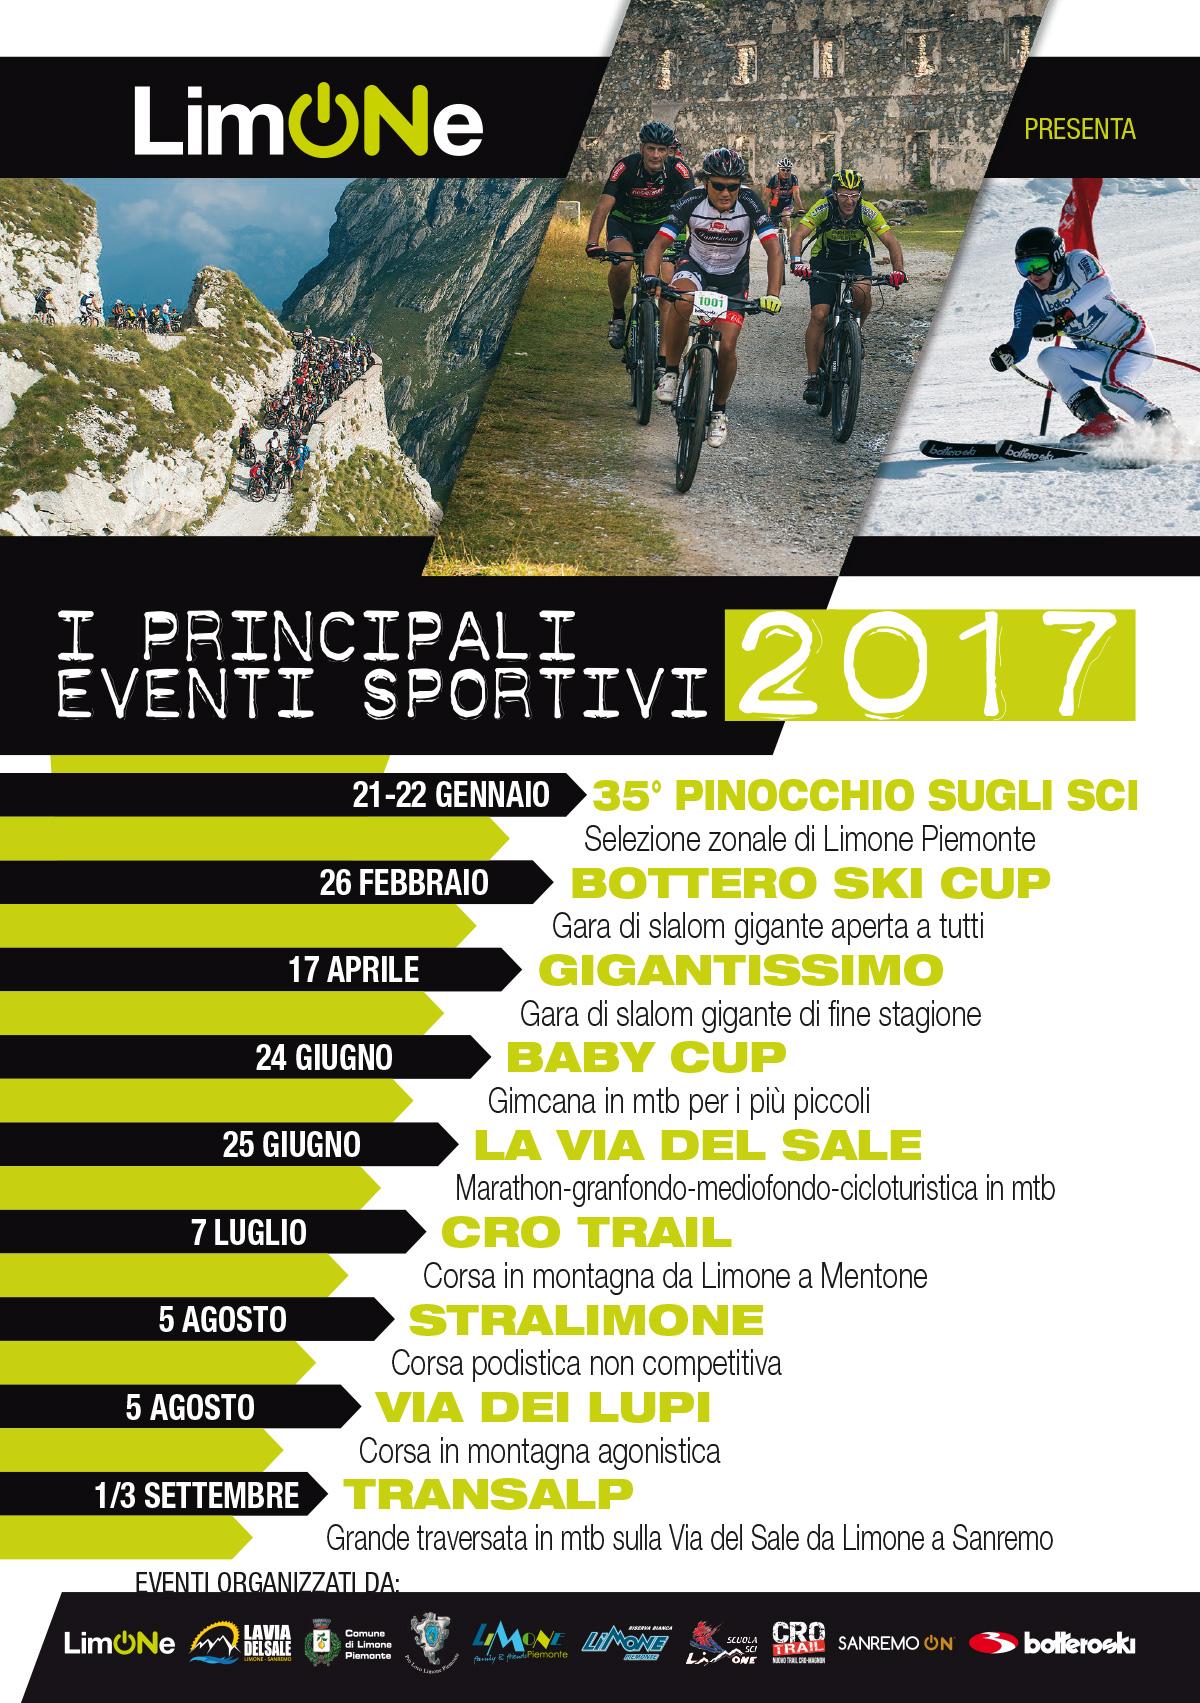 Calendario Sportivo.Calendario Eventi Sportivi 2017 Limone On